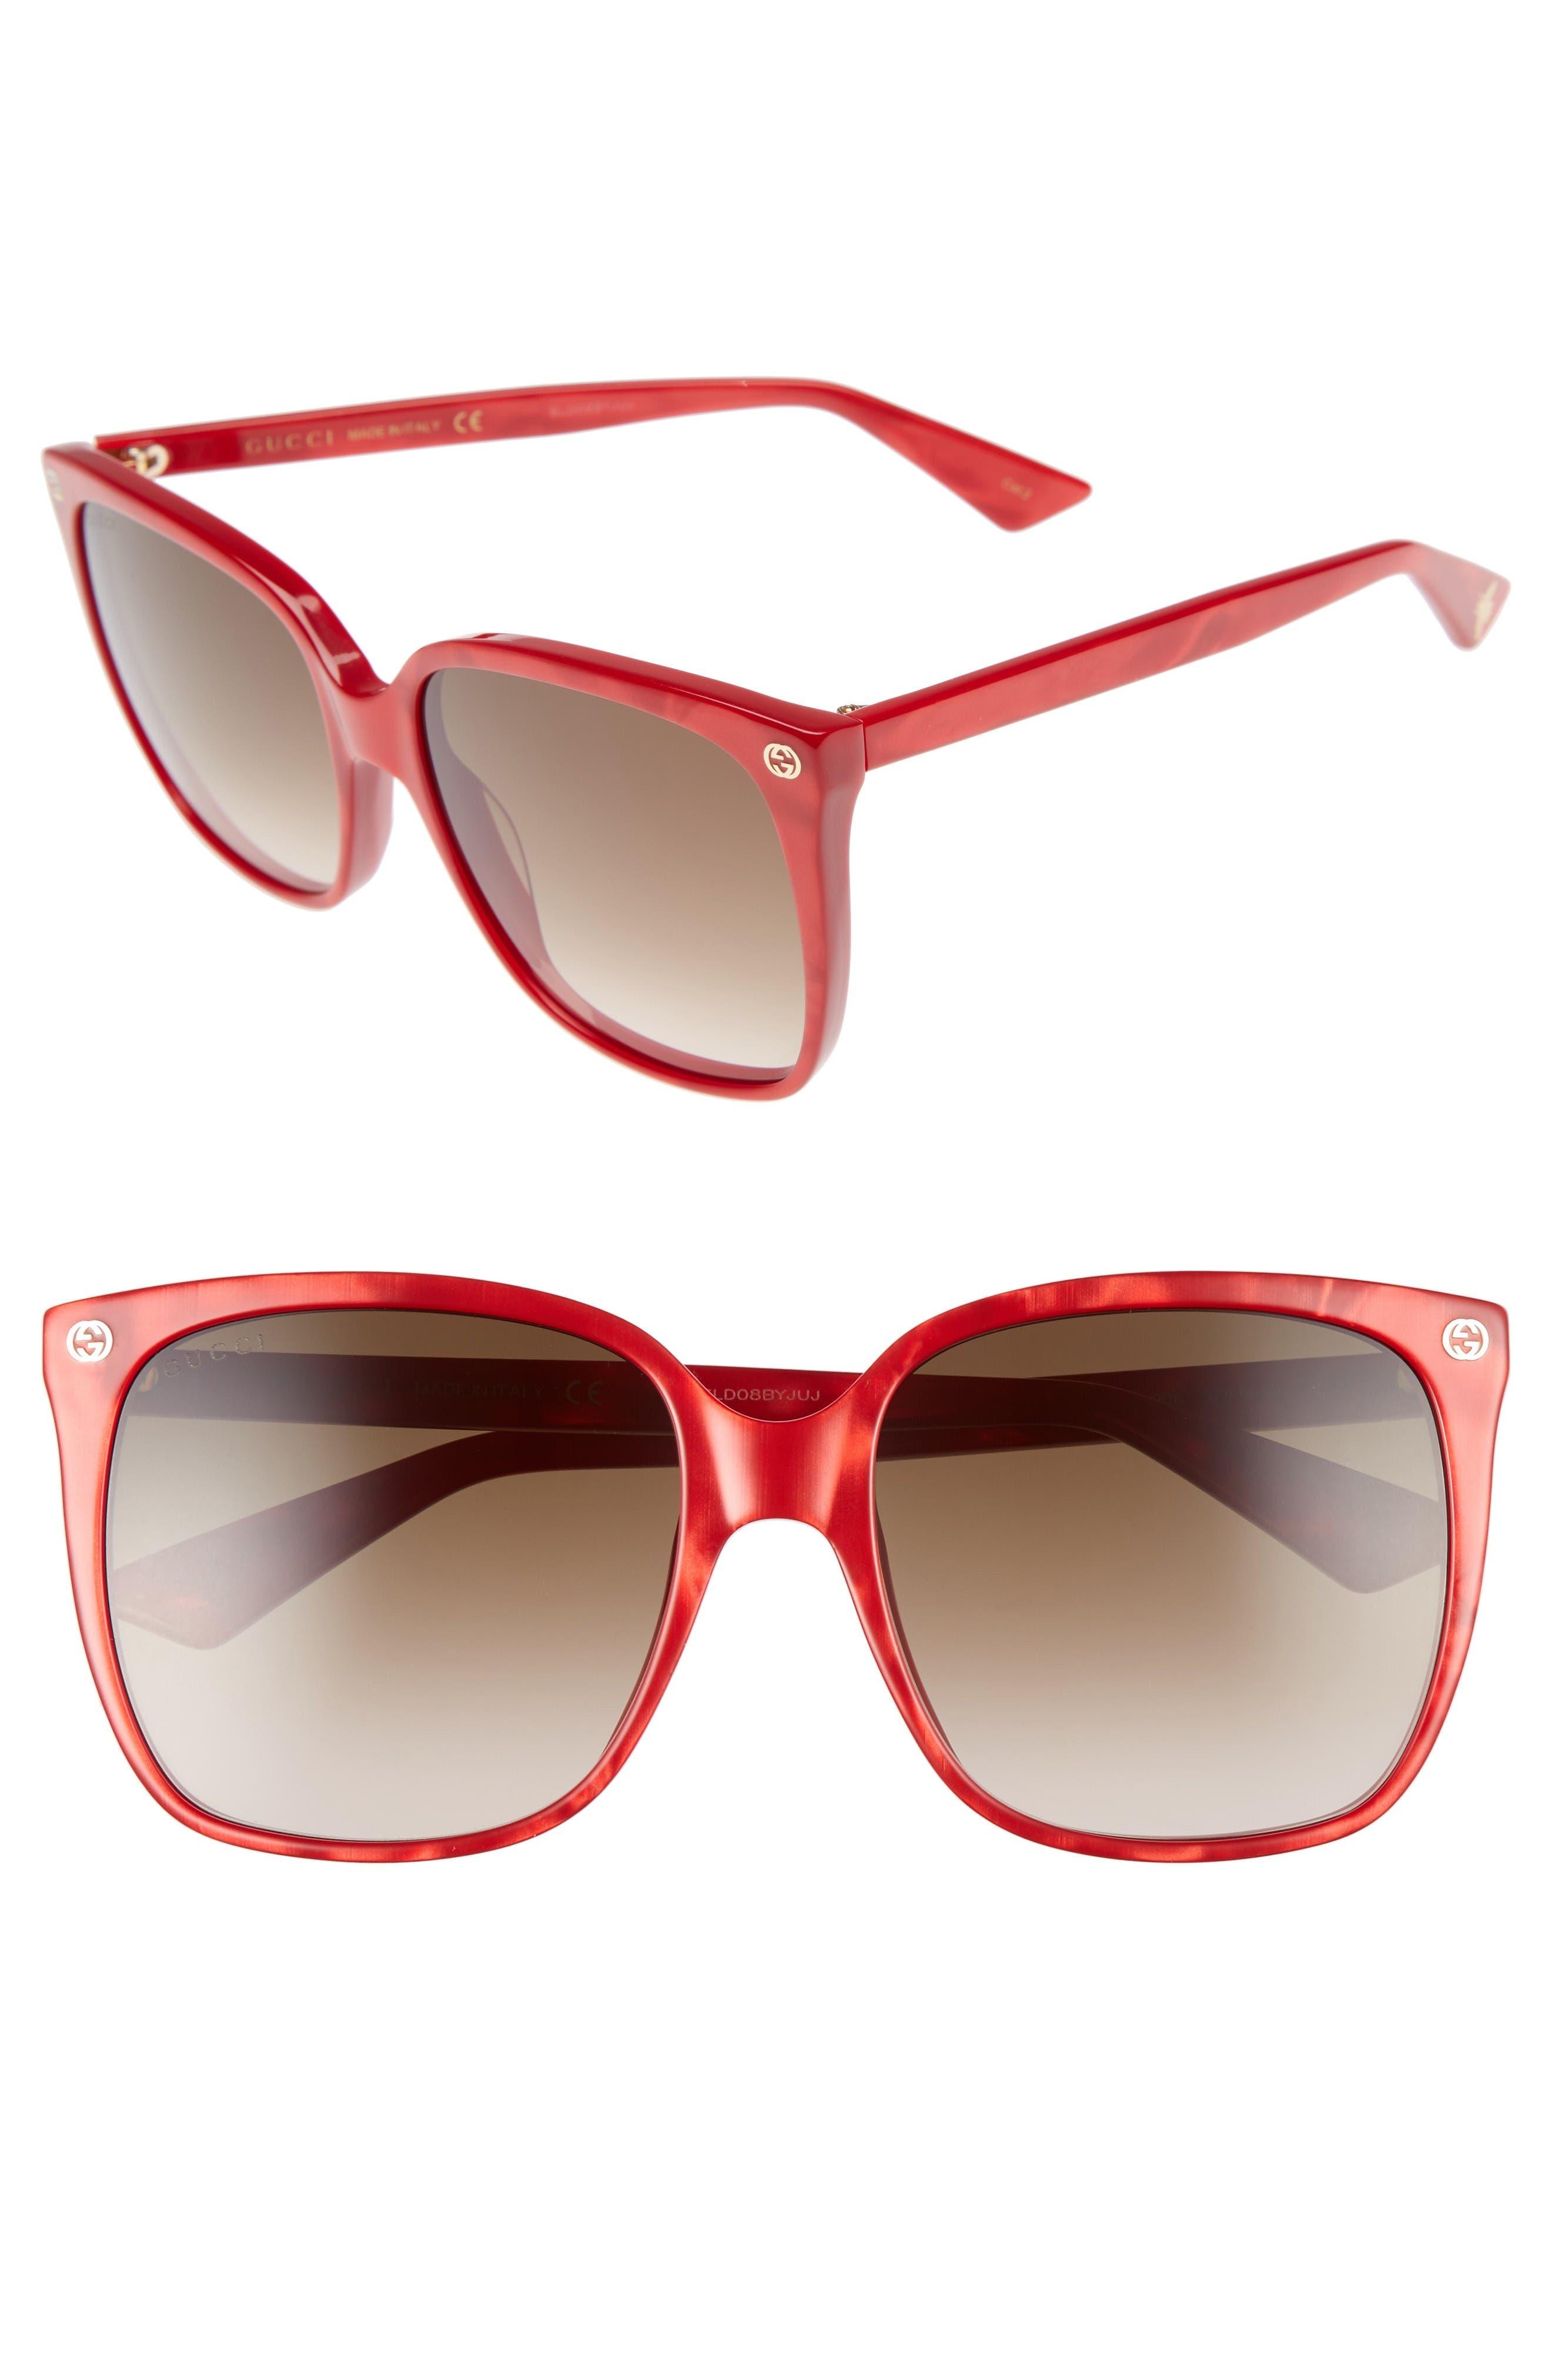 Alternate Image 1 Selected - Gucci 57mm Square Sunglasses